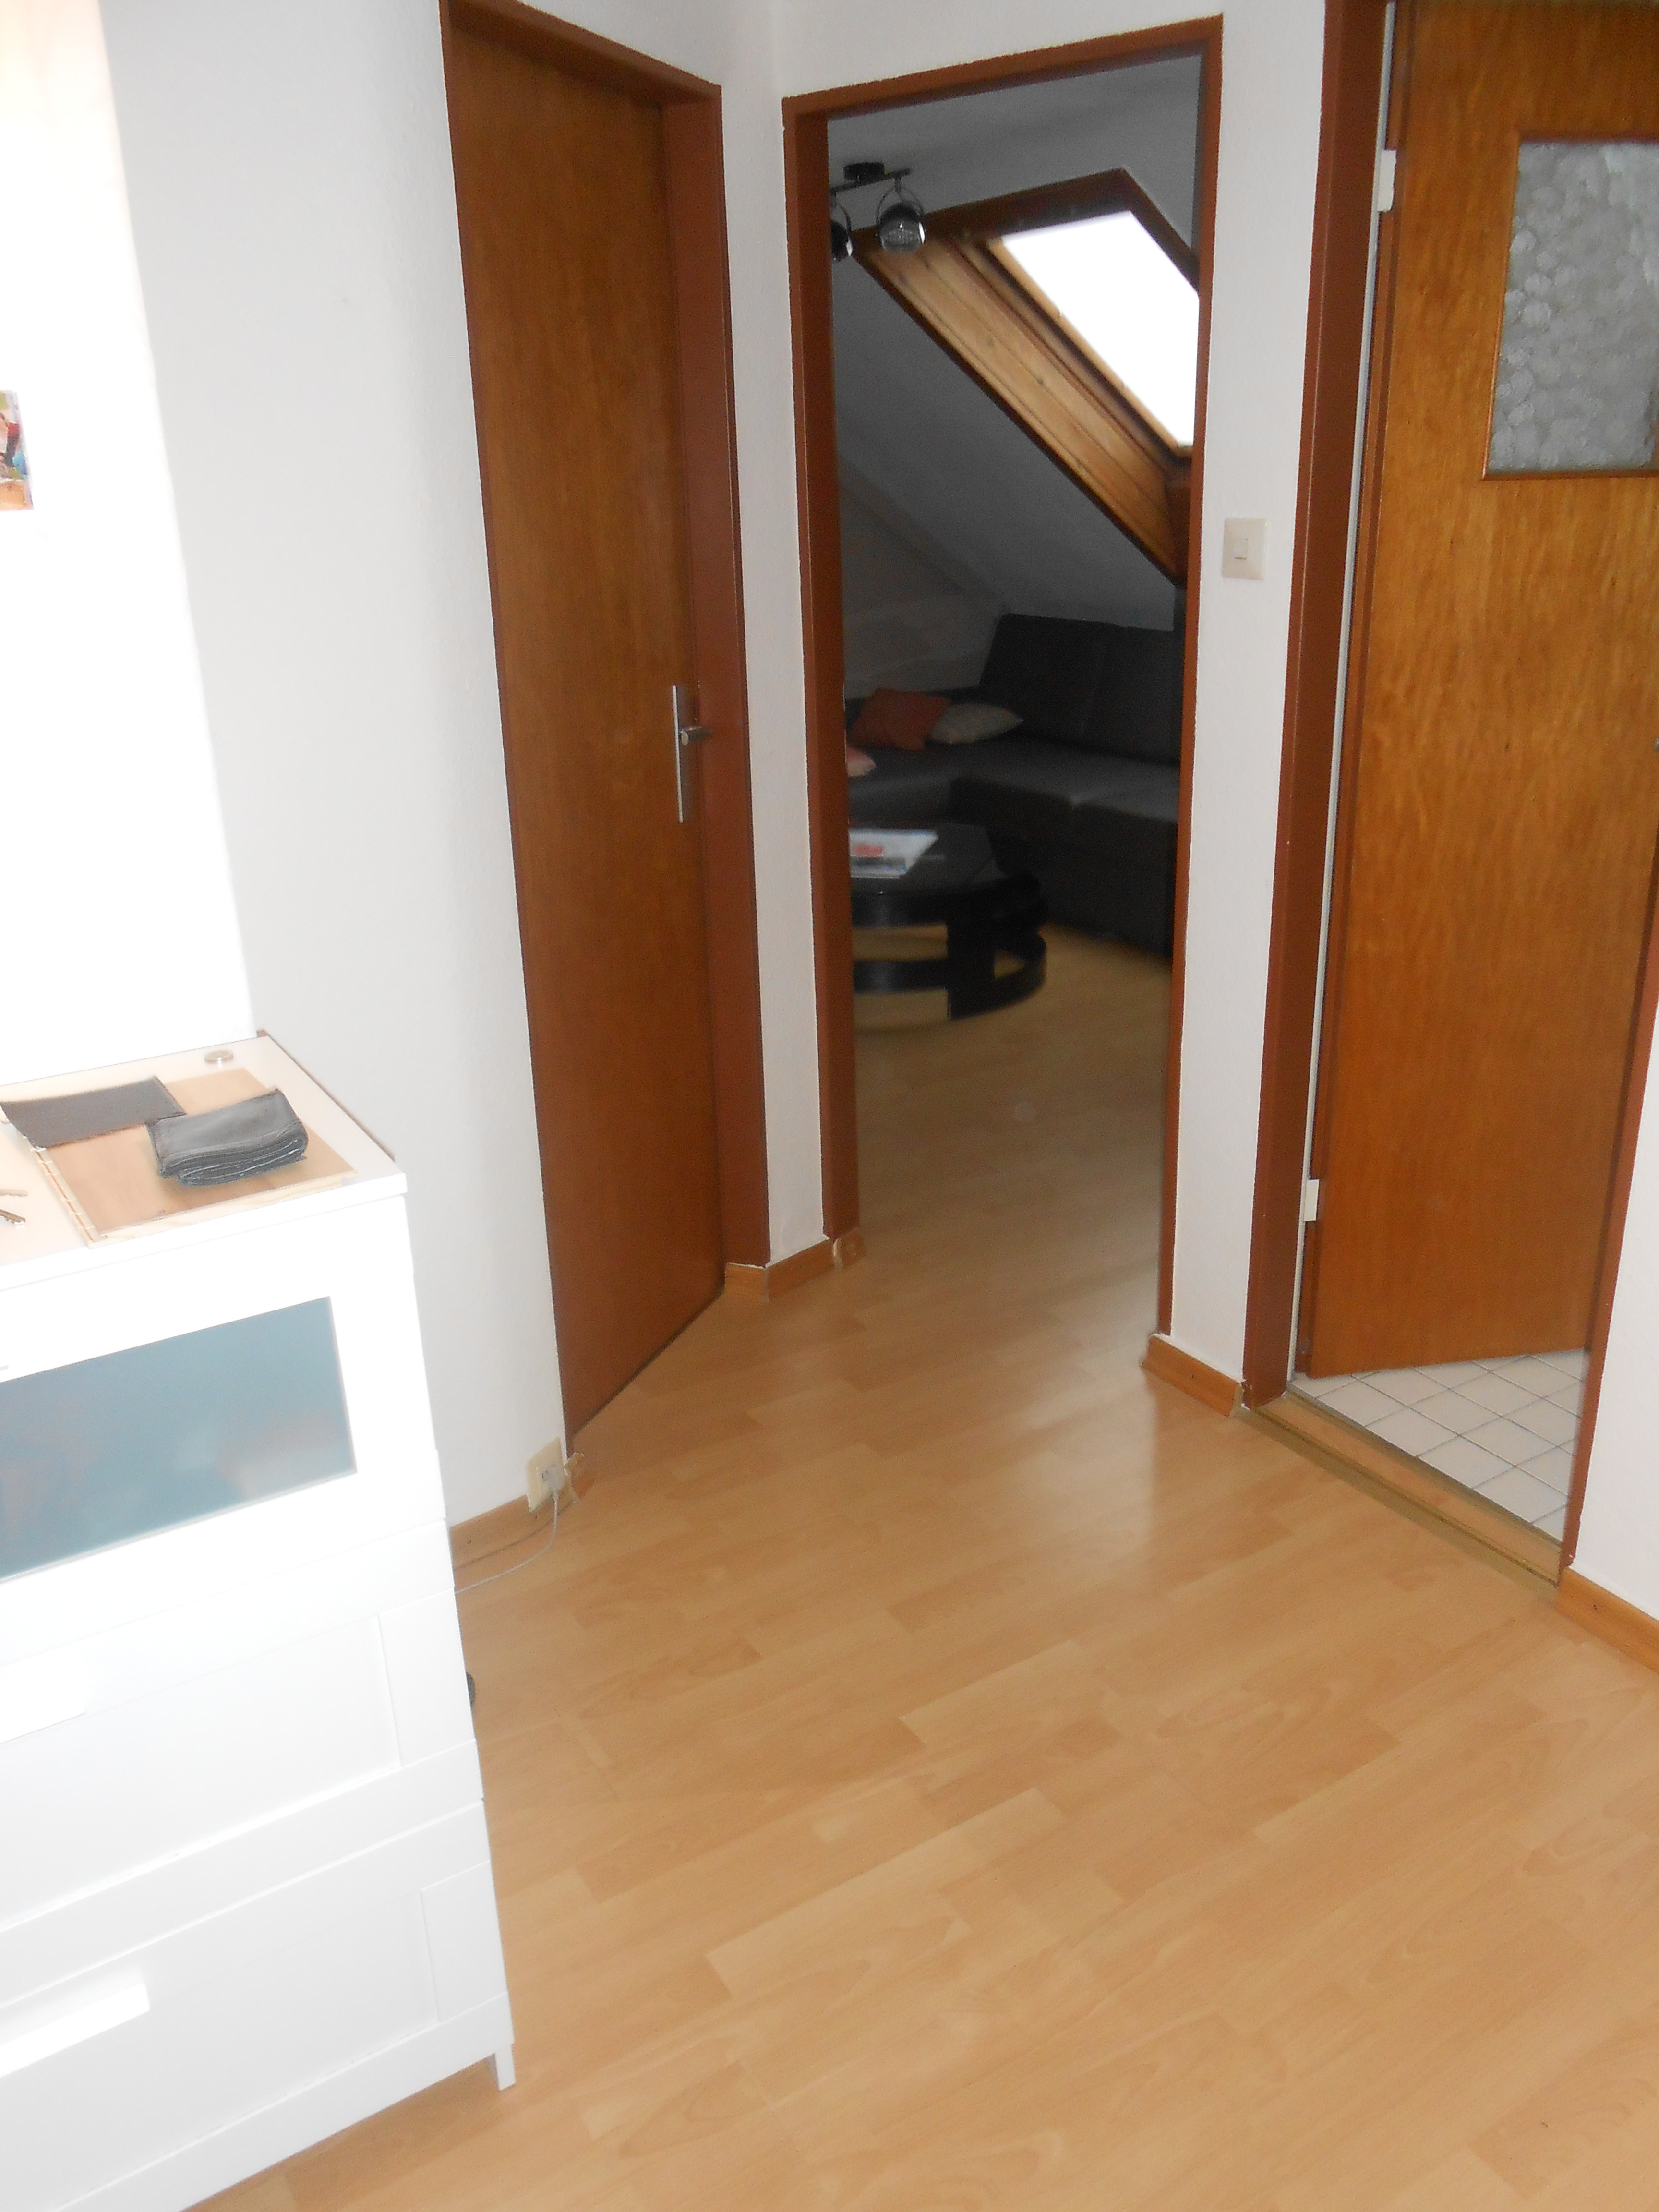 2 zimmer wohnung ruesselsheim moebliert 1 hettich immobilien. Black Bedroom Furniture Sets. Home Design Ideas